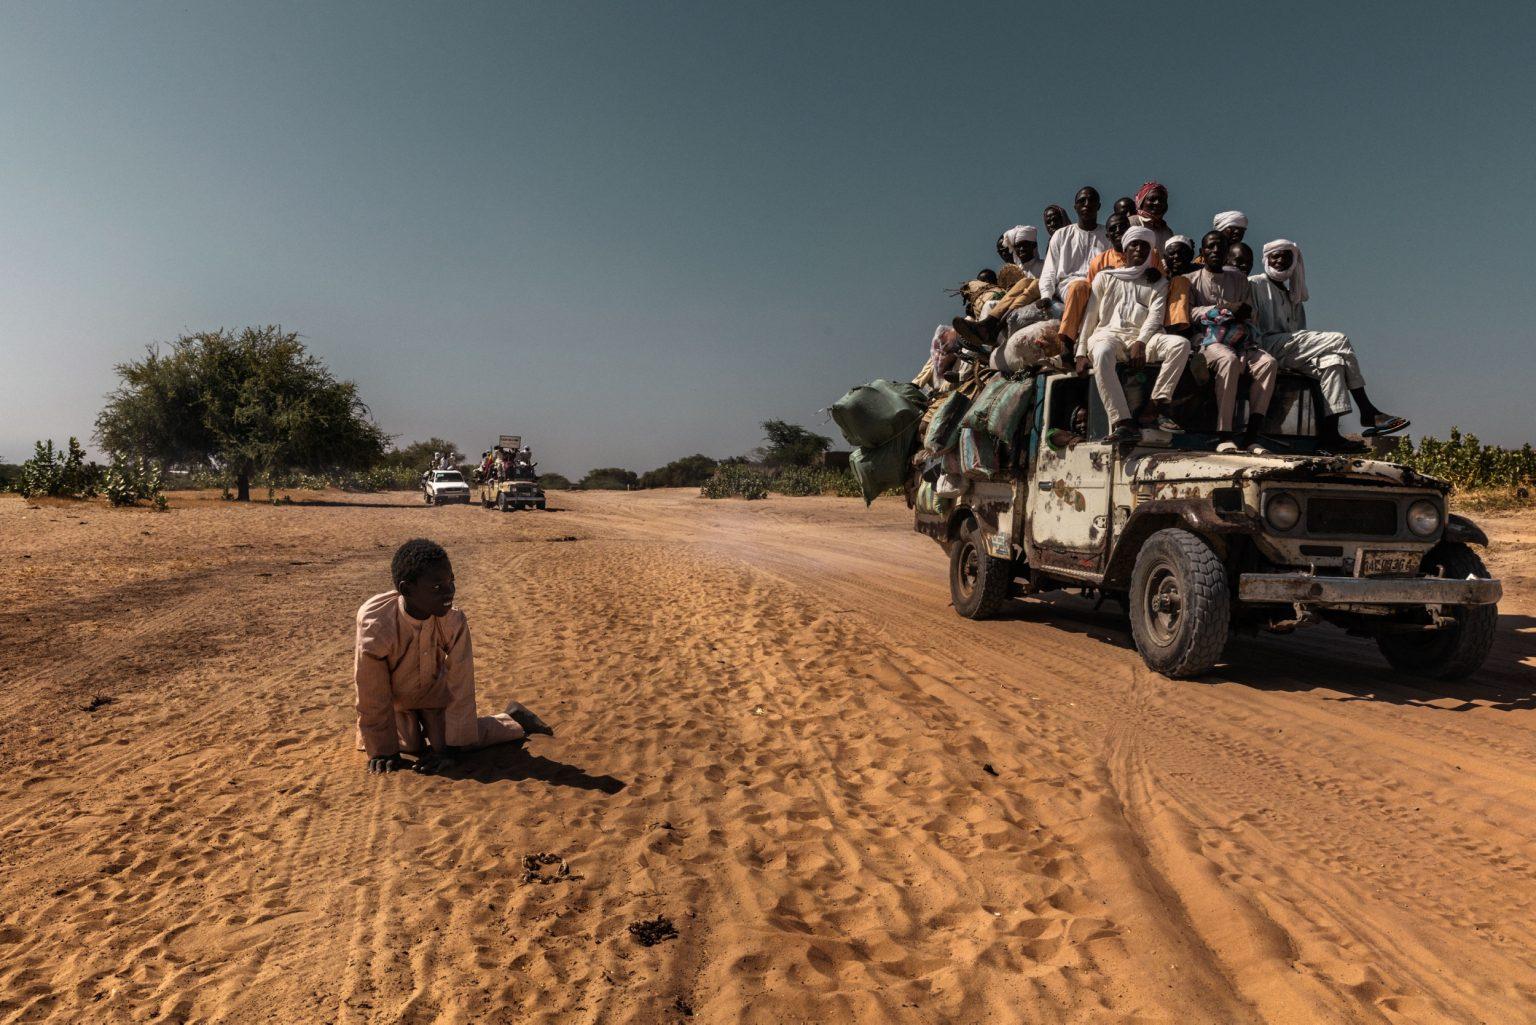 Africa, Chad, Bol, October 2018 - A paraplegic child beggar crawling across the red-hot sand to go and beg in the centre of Bol. >< Africa, Ciad, Bol, Ottobre 2018 - Un bambino mendicante paraplegico si trascina lungo le sabbie rosse e calde per andare a mendicare al centro di Bol.*** SPECIAL   FEE   APPLIES *** *** Local Caption *** 01362896